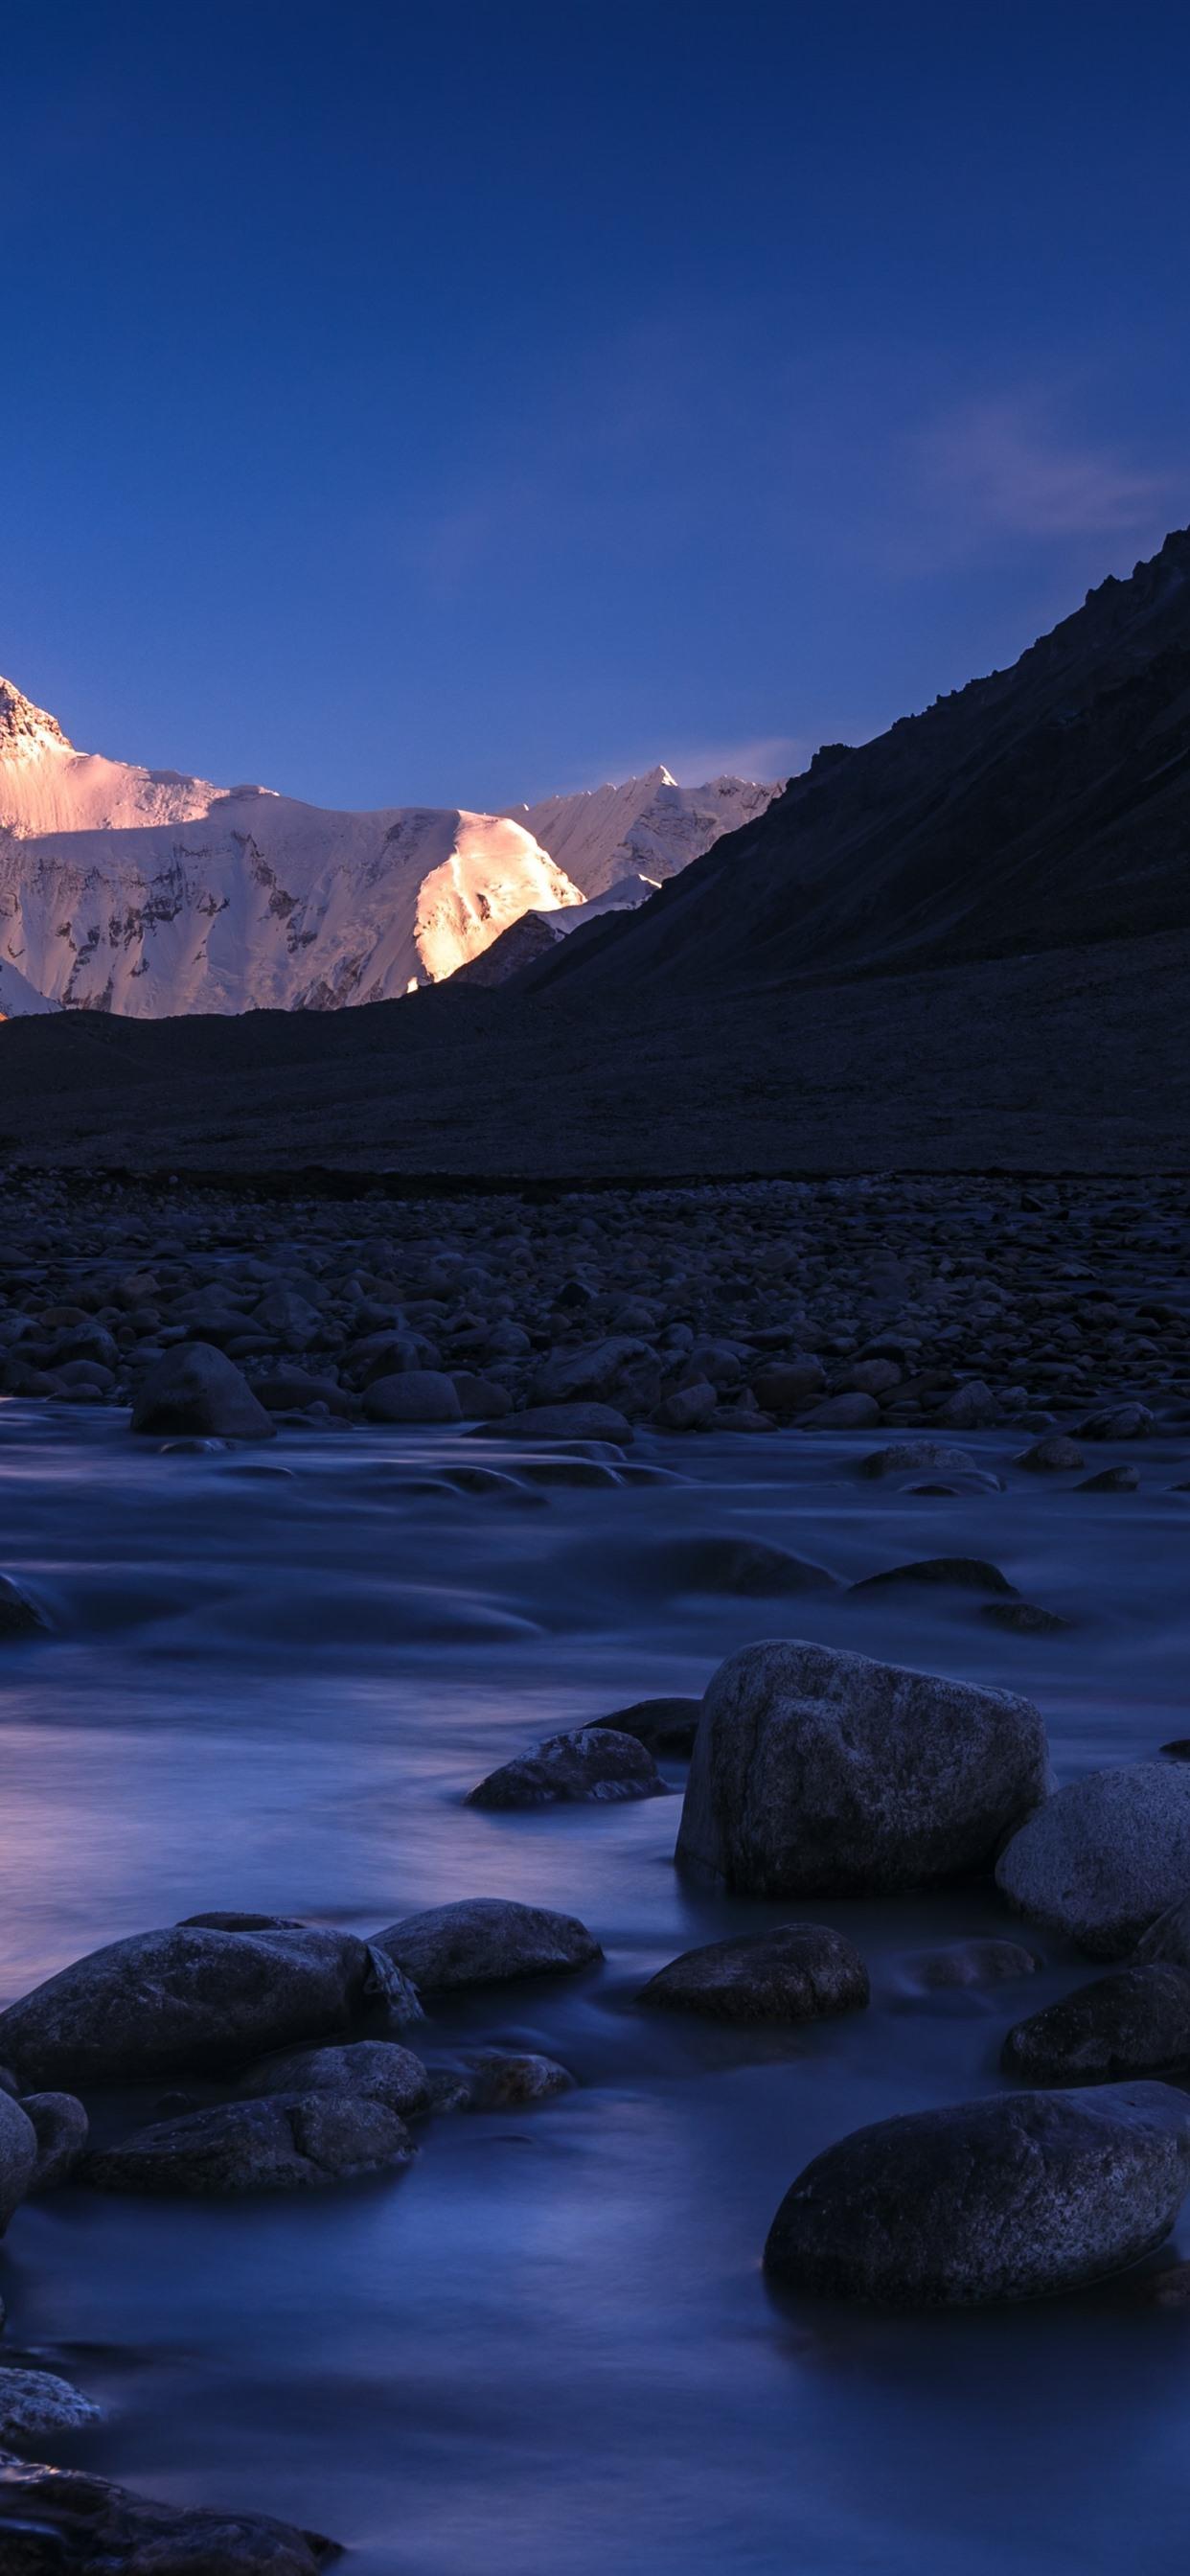 Mountains Stones River Nature Landscape 1242x2688 Iphone Xs Max